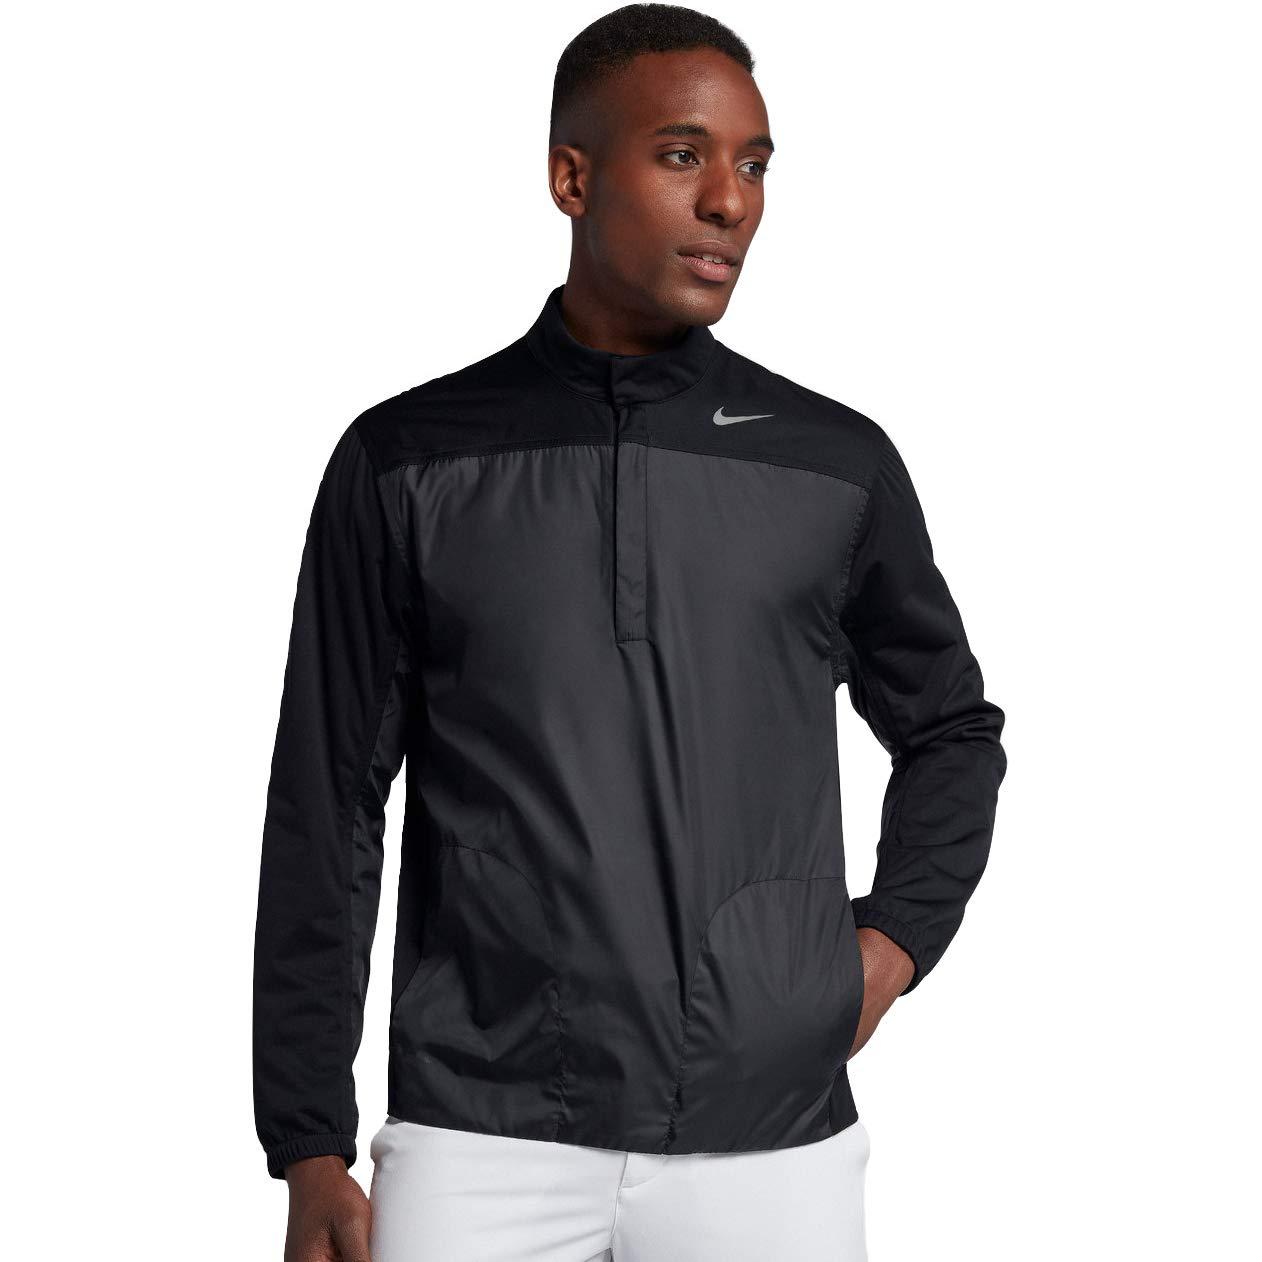 36a7bfe00 Amazon.com : Nike Shield Half Zip Core Golf Jacket 2018 : Clothing